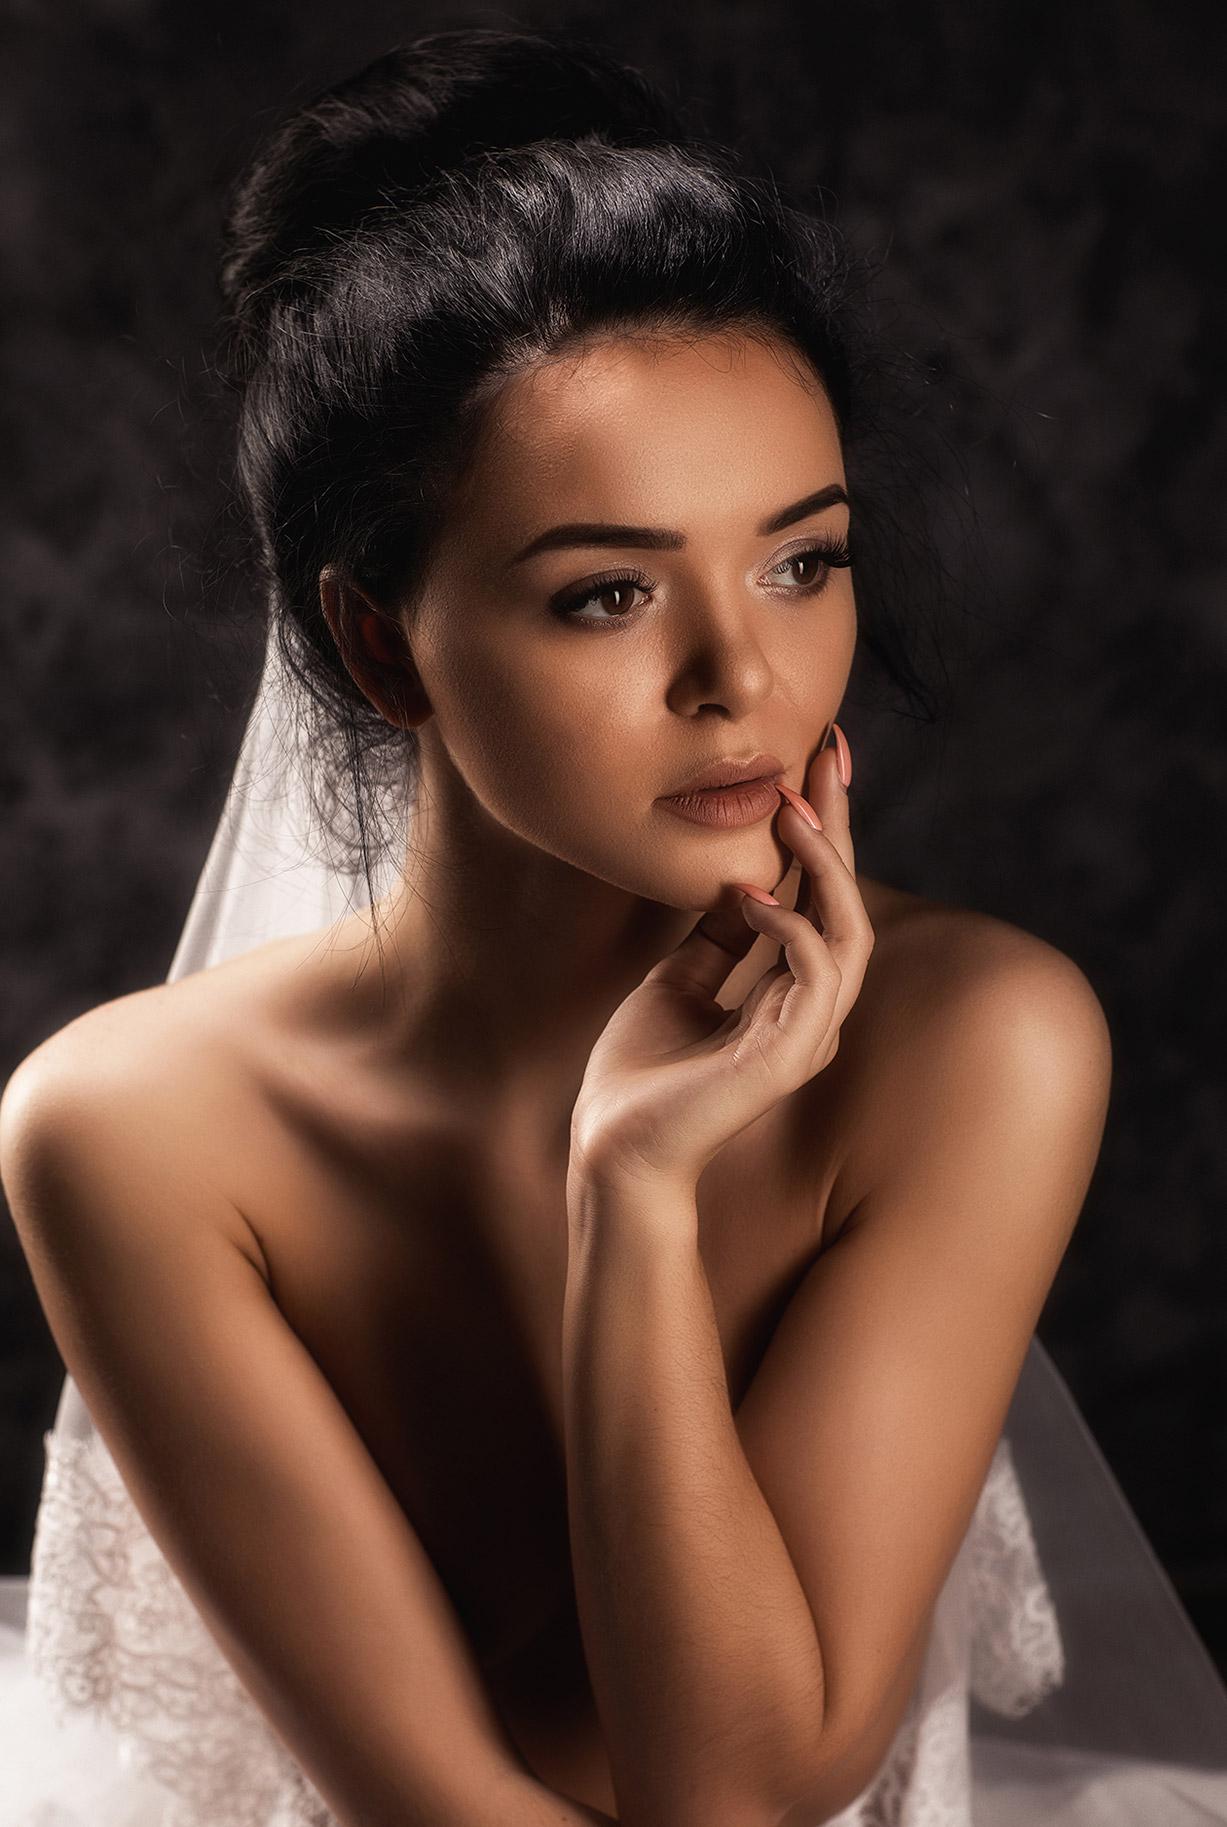 невеста Алина Бош / Alina Bosh by Roman Tretyakov